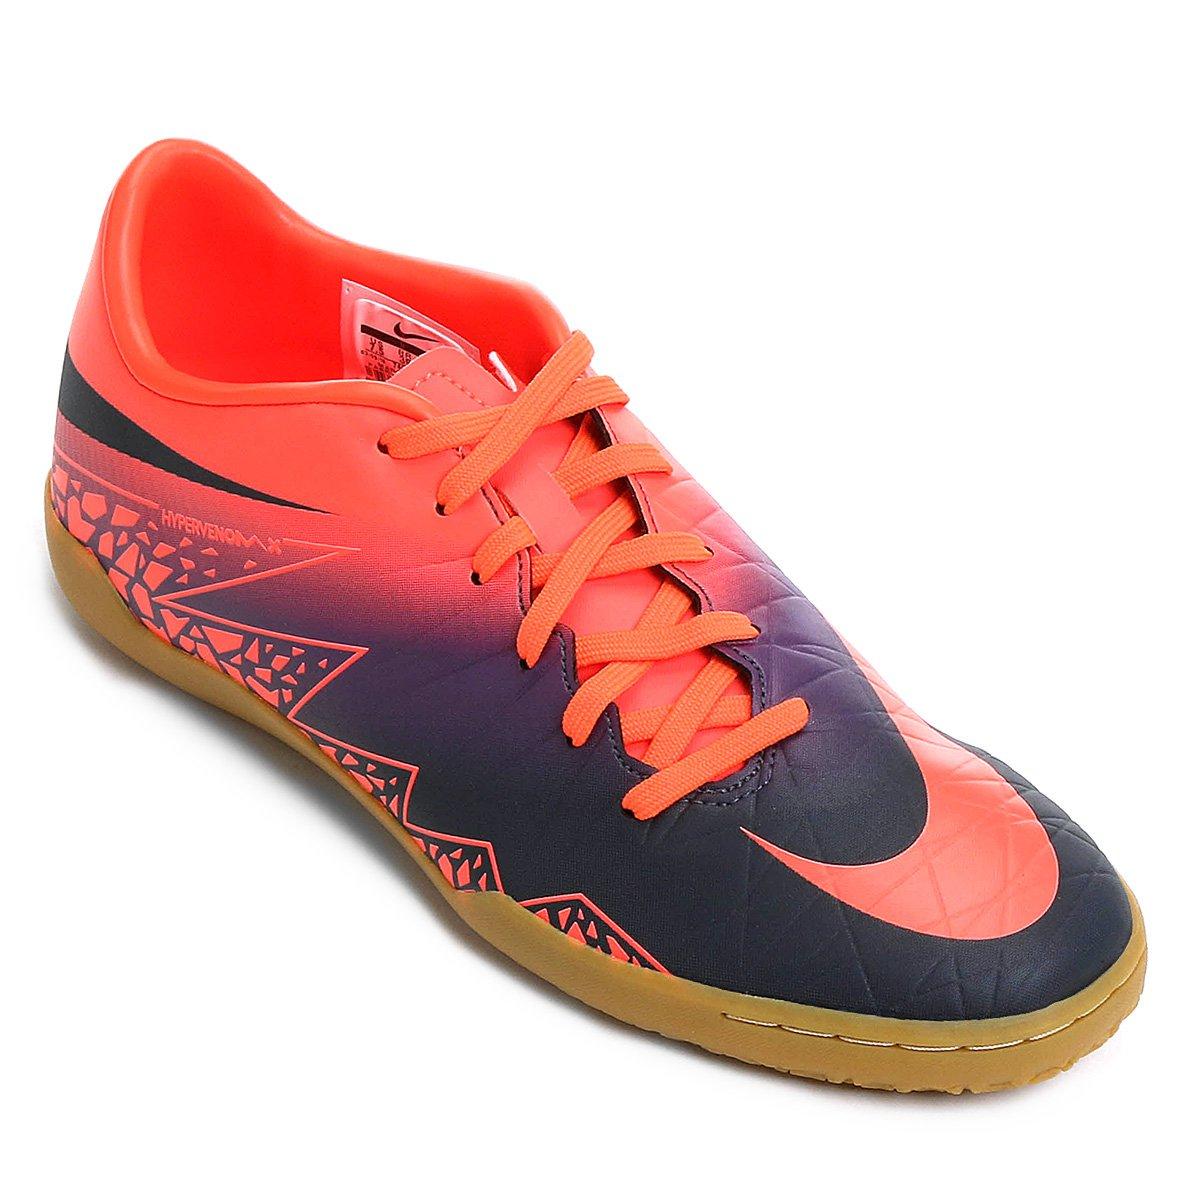 Chuteira Futsal Nike Hypervenom Phelon 2 IC Masculina - Compre Agora ... 8e8c9be8eafac